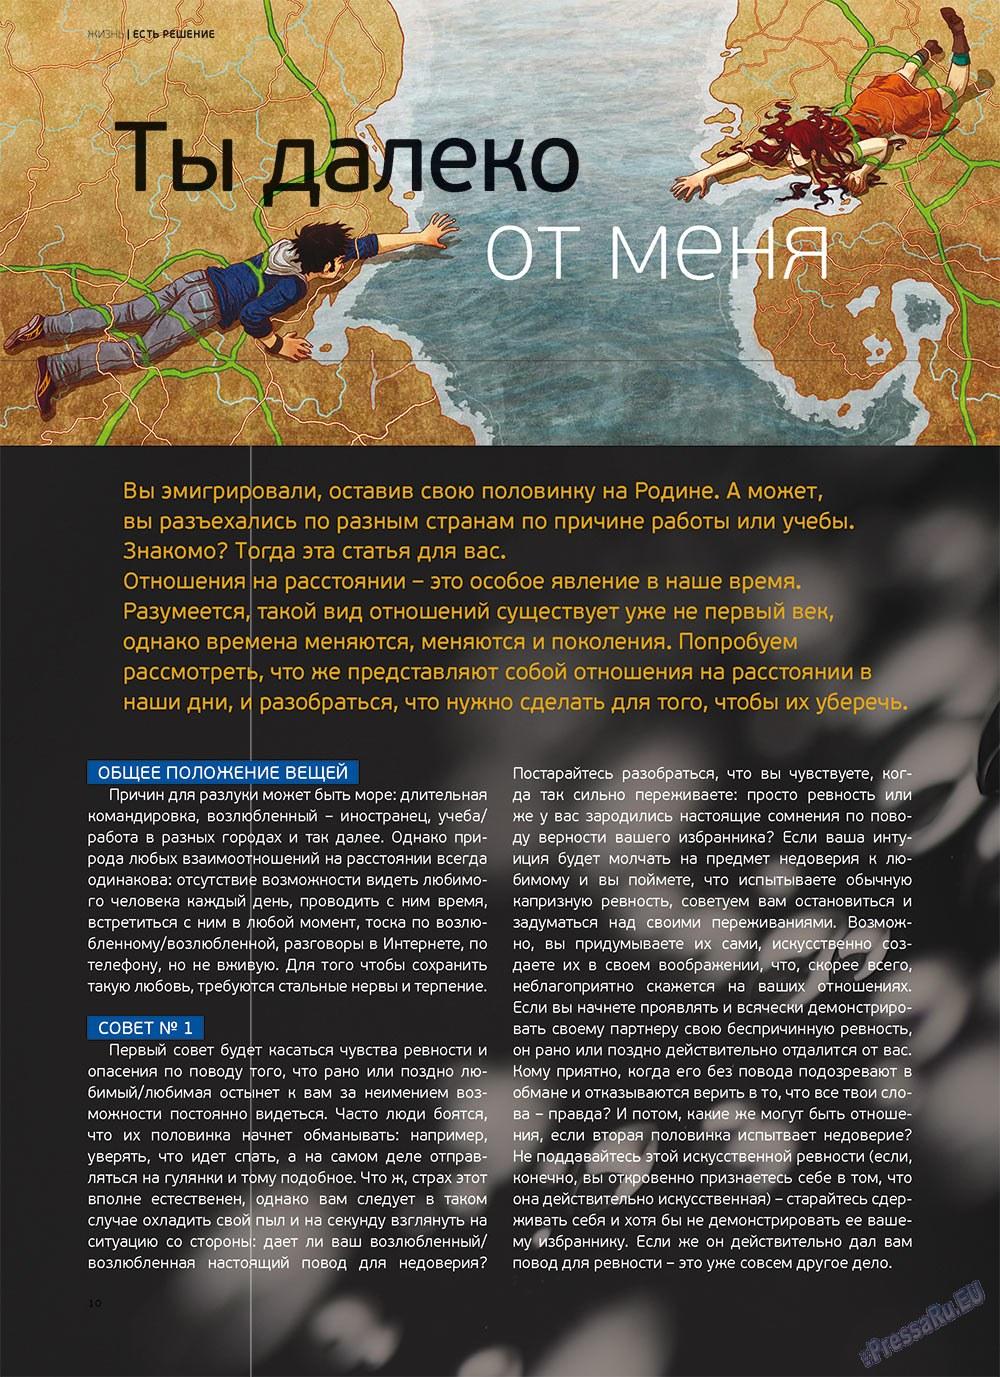 Артек (журнал). 2012 год, номер 3, стр. 12